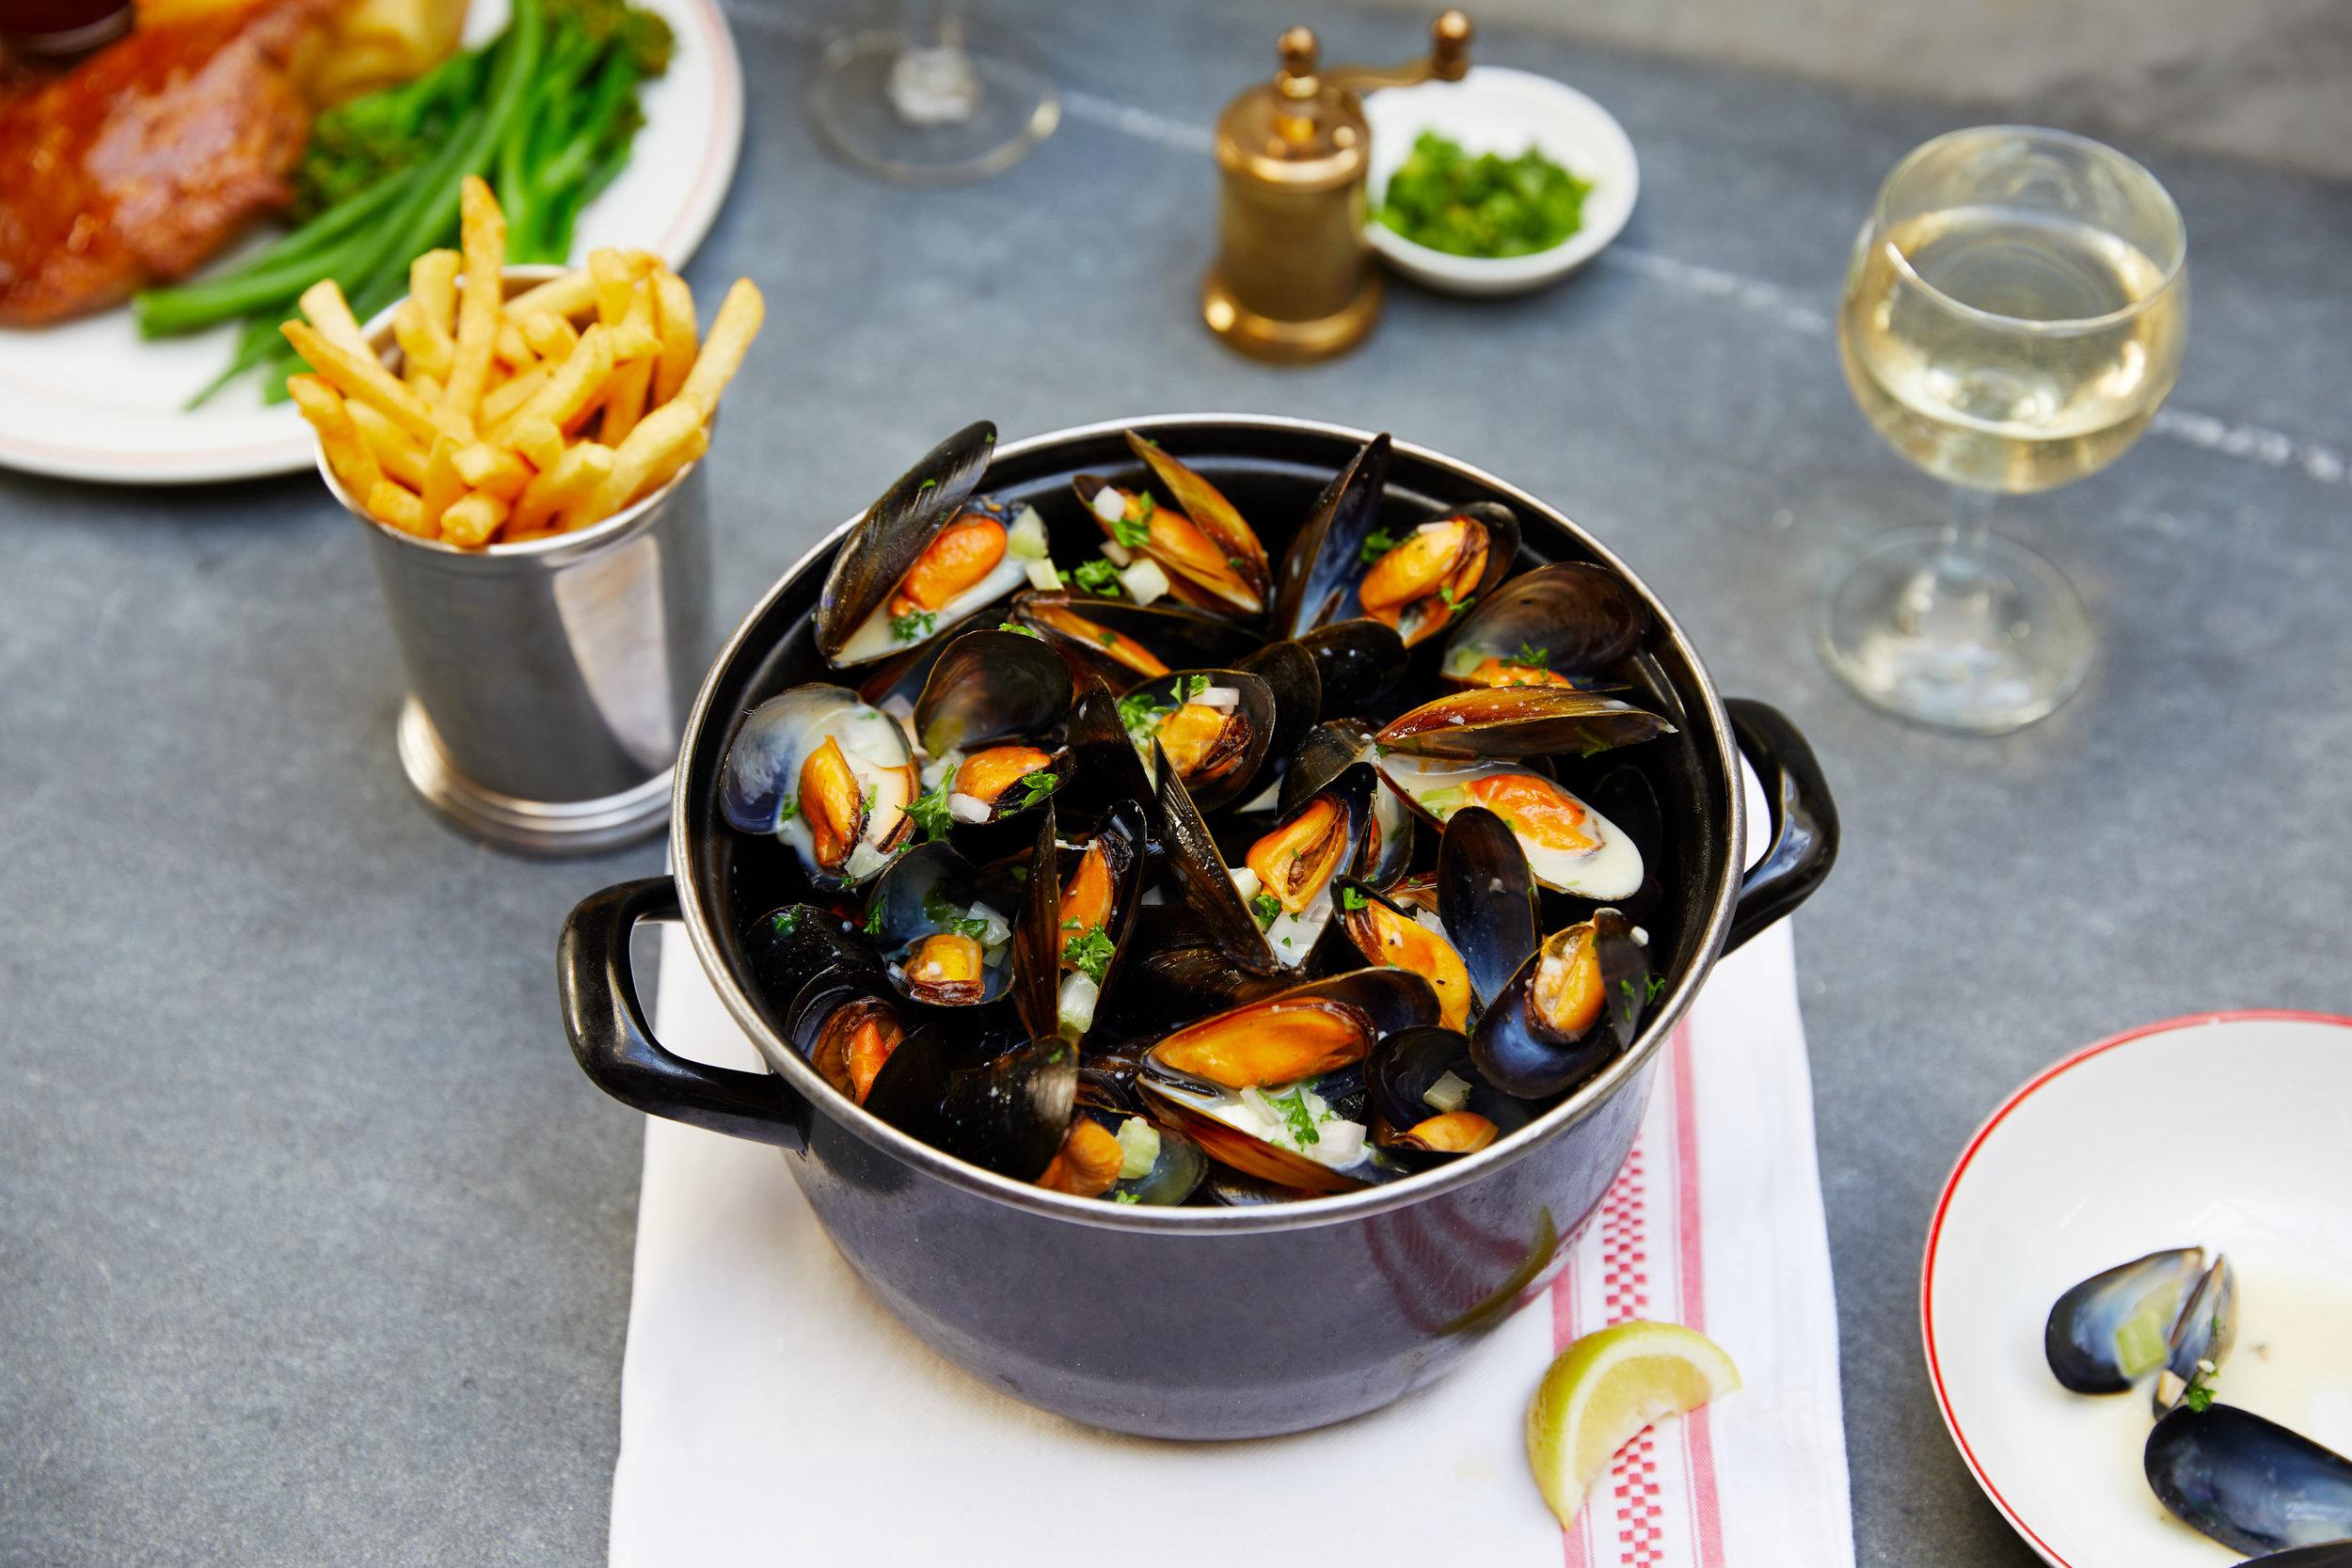 20181004-mussels377.jpg